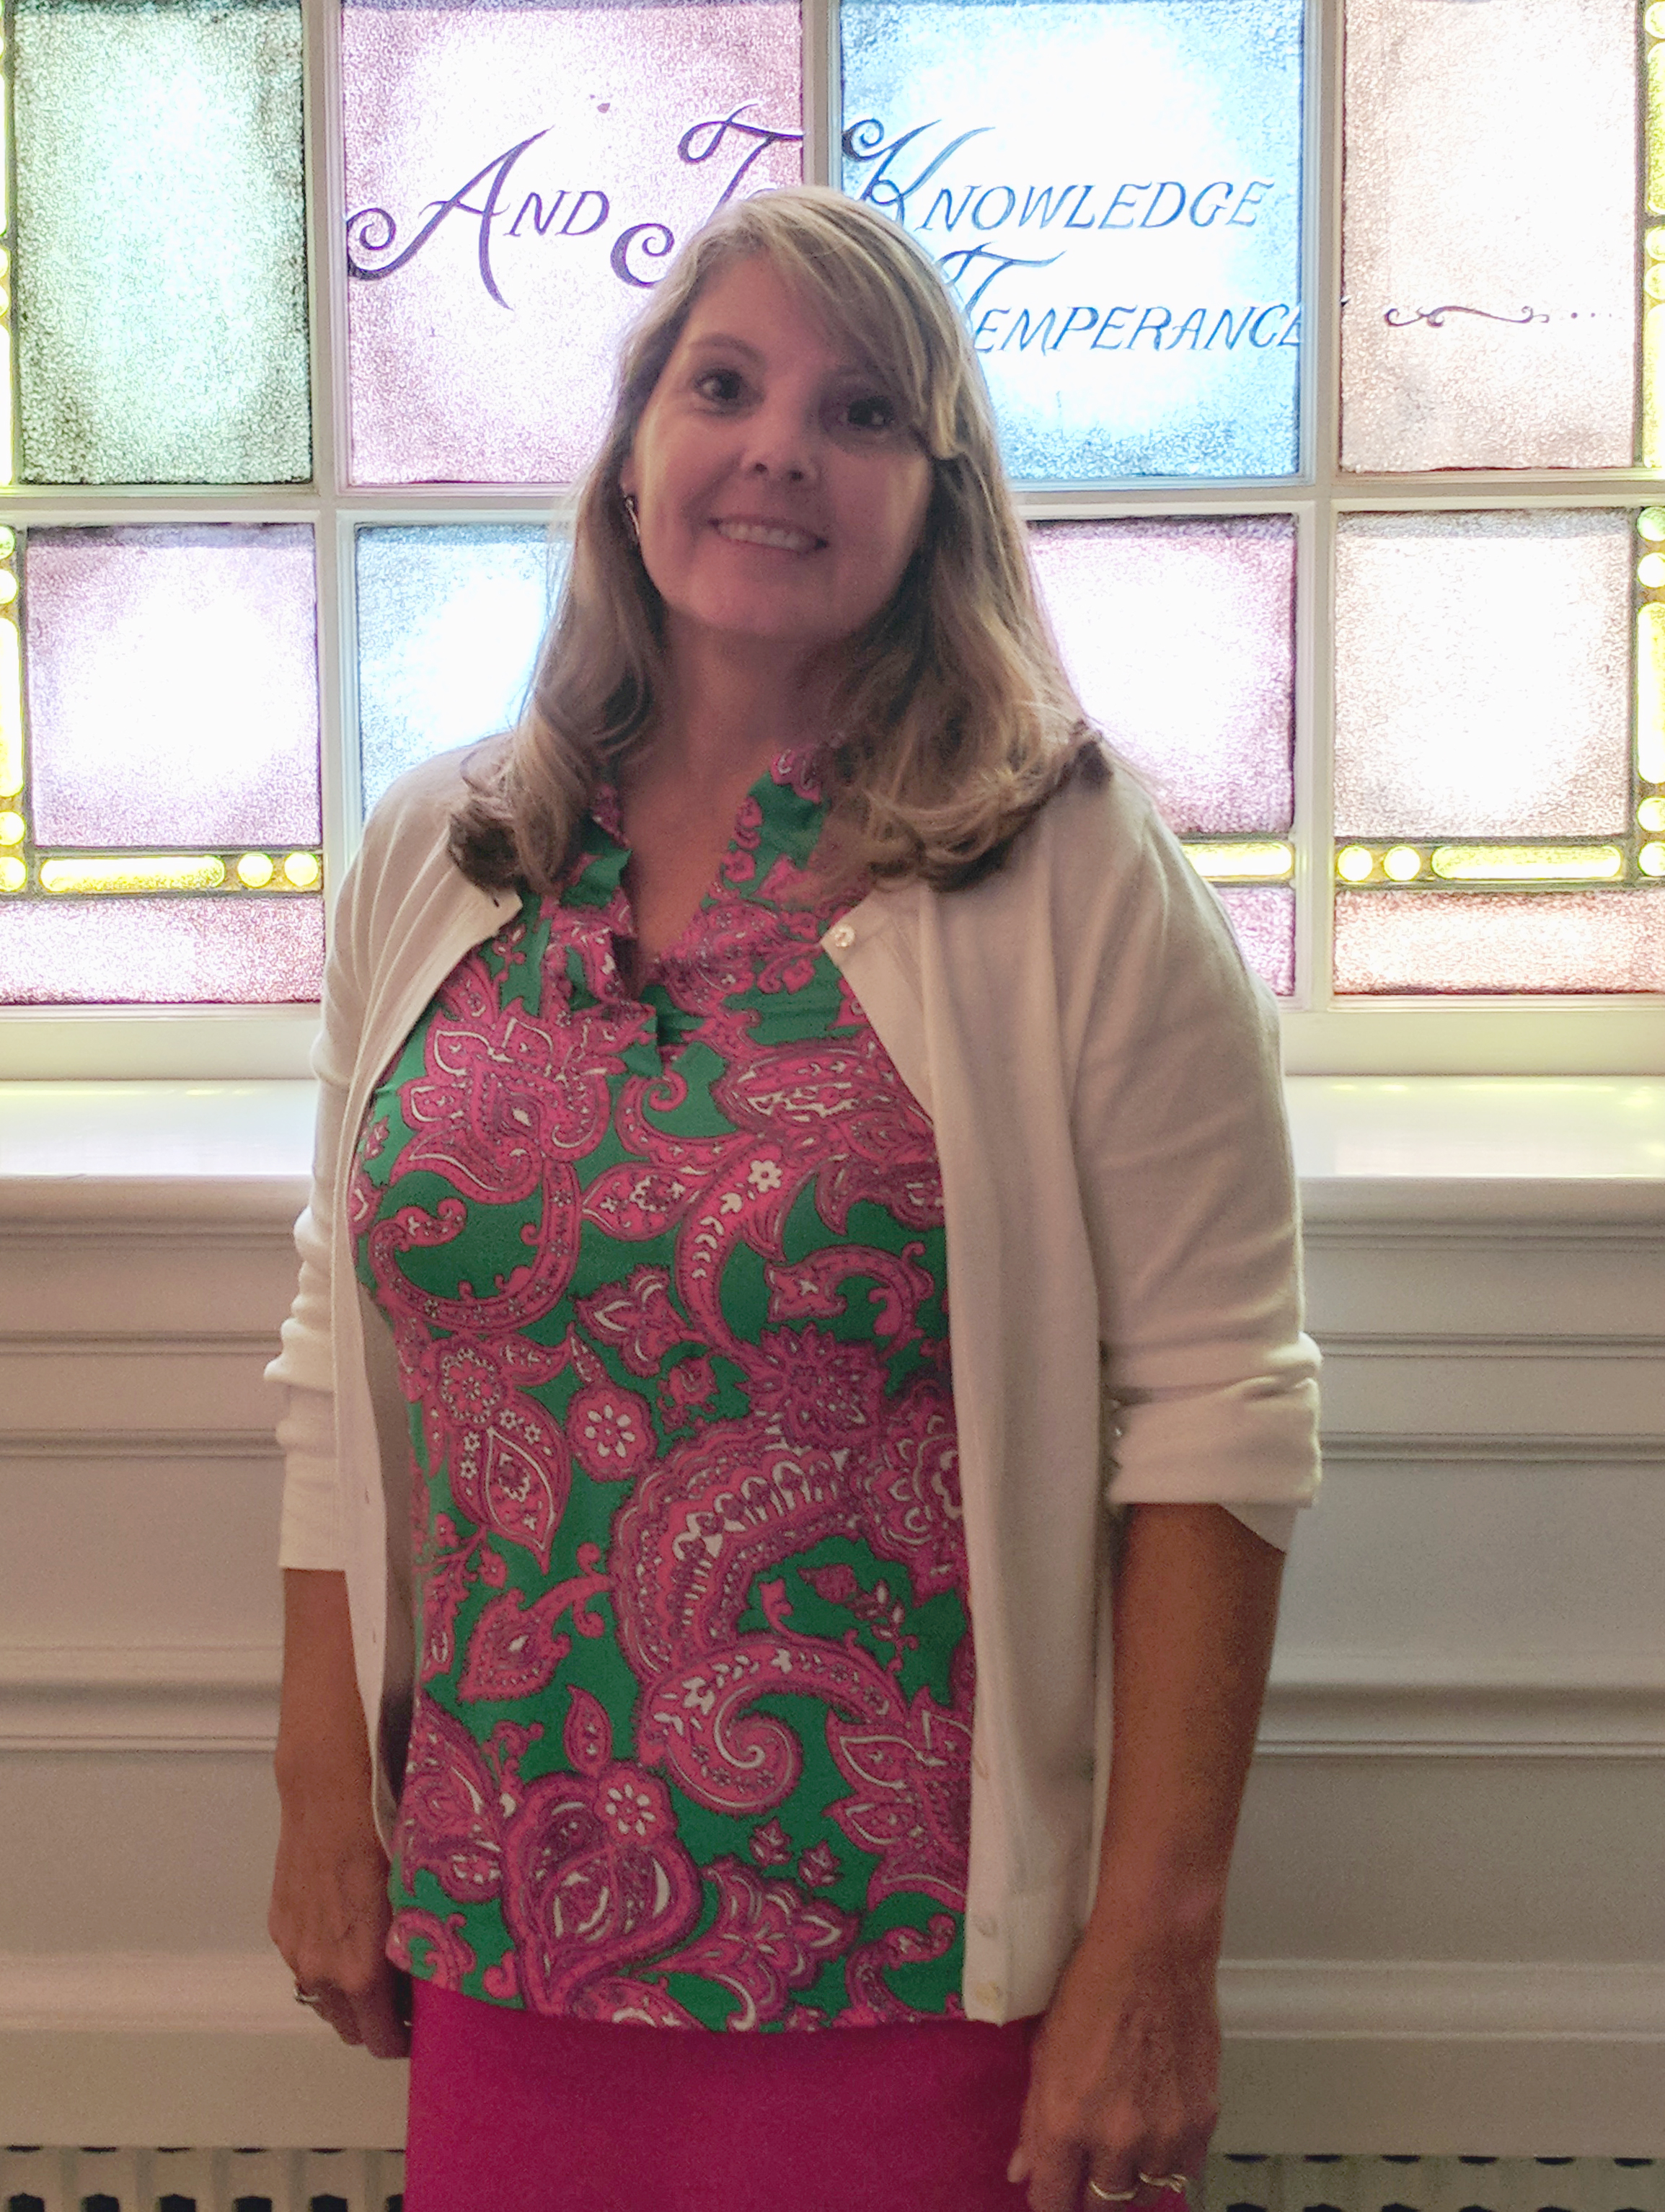 debbie gordonpreschool director - Debbie Gordon has been an integral part of our children's programming for a long time, serving as a Pre-K teacher before she became the program's director around 2009.